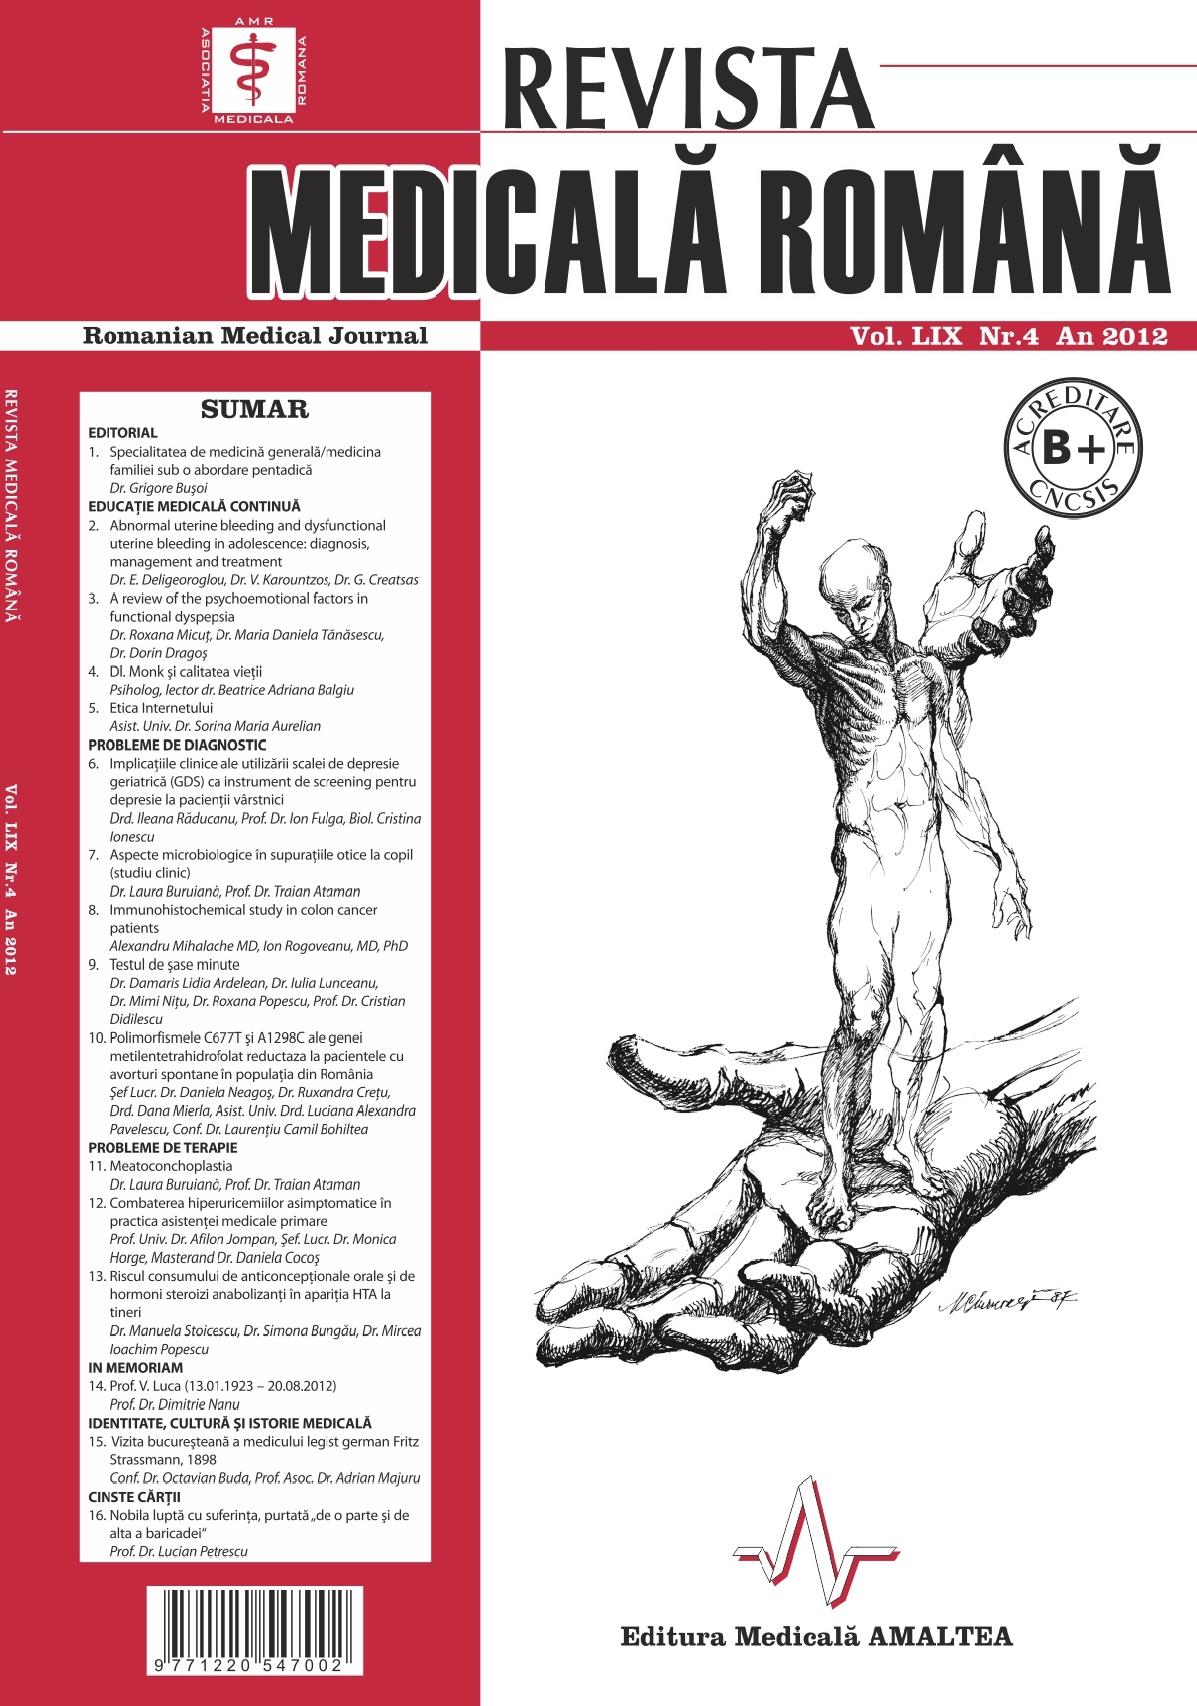 REVISTA MEDICALA ROMANA - Romanian Medical Journal, Vol. LIX, Nr. 4, An 2012